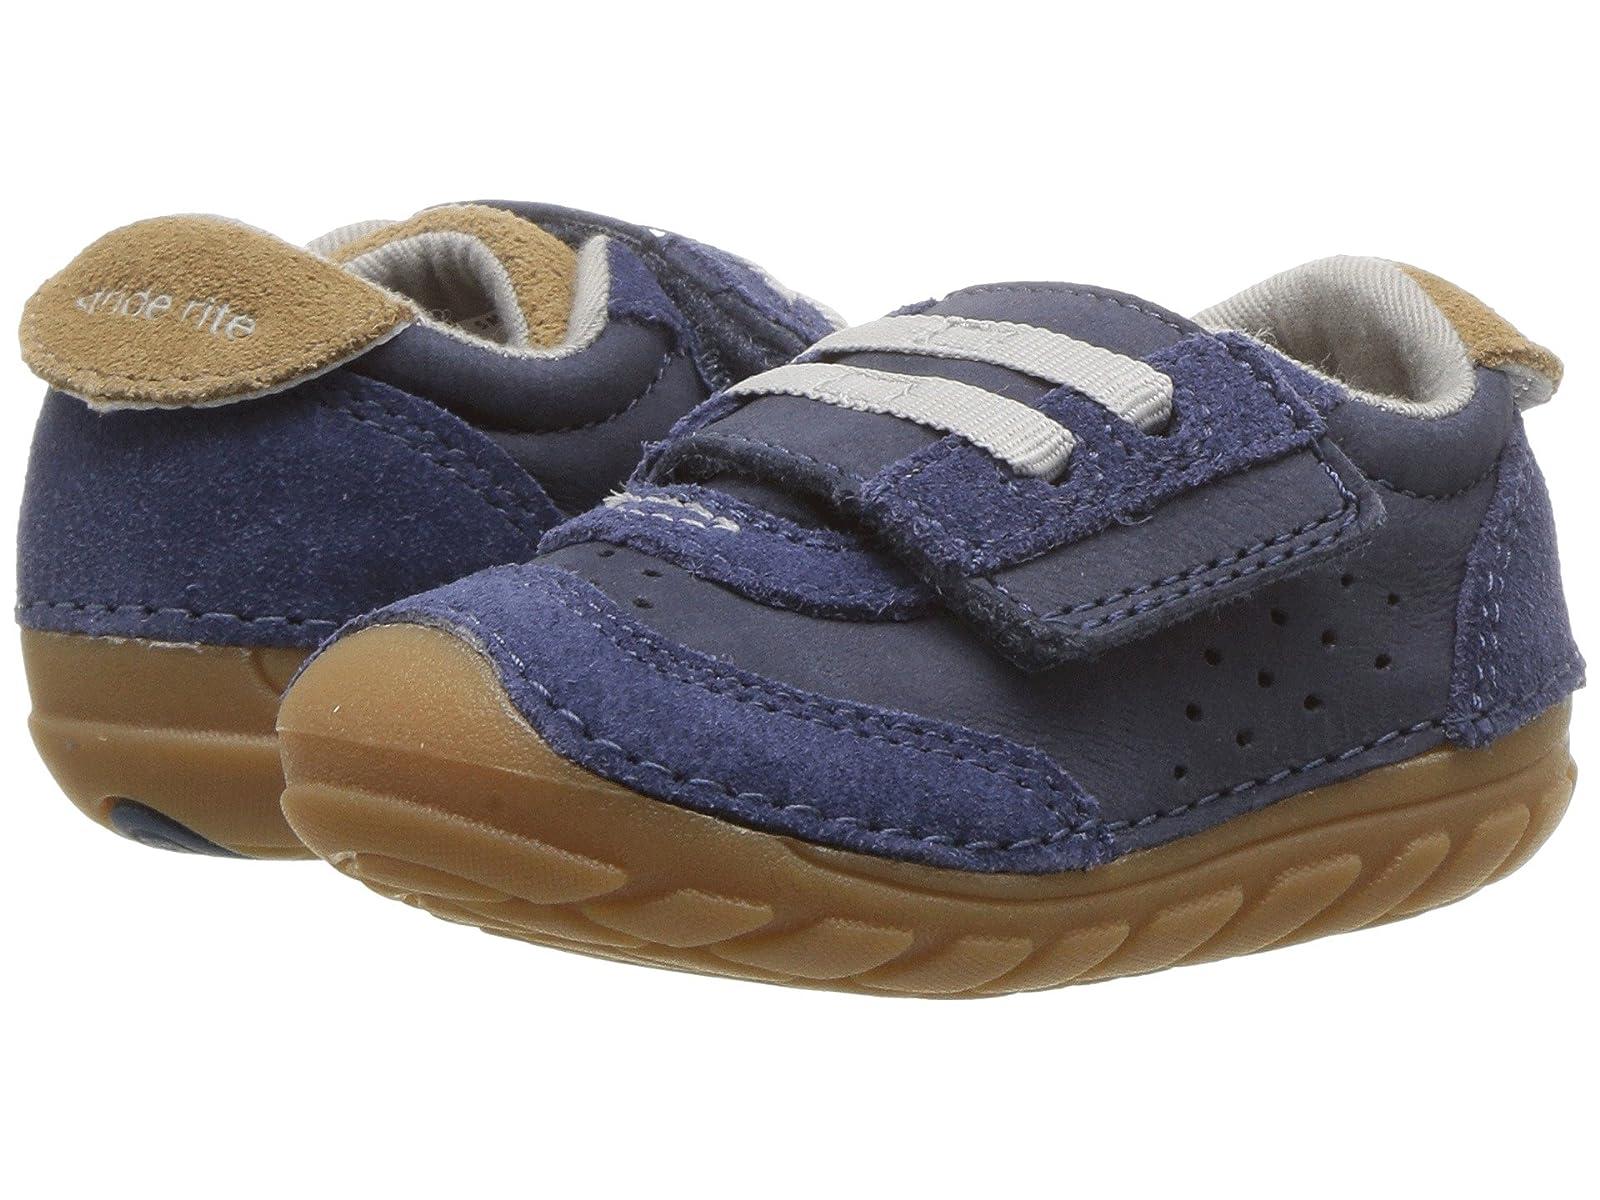 Stride Rite SM Wyatt (Toddler/Little Kid)Atmospheric grades have affordable shoes